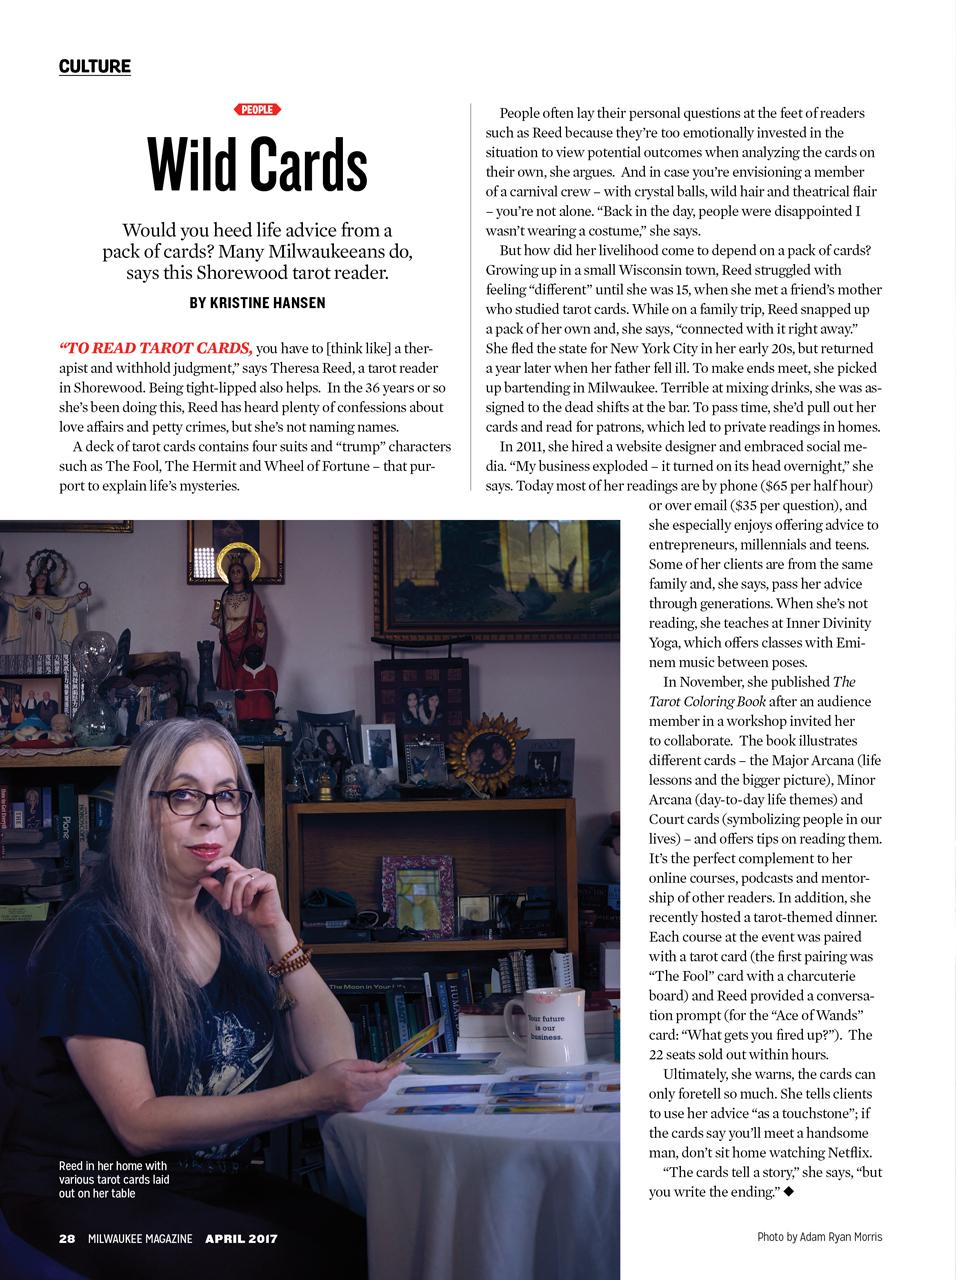 0417_Wild-Cards_Adam-Ryan-Morris_Kristine-Hansen.jpg